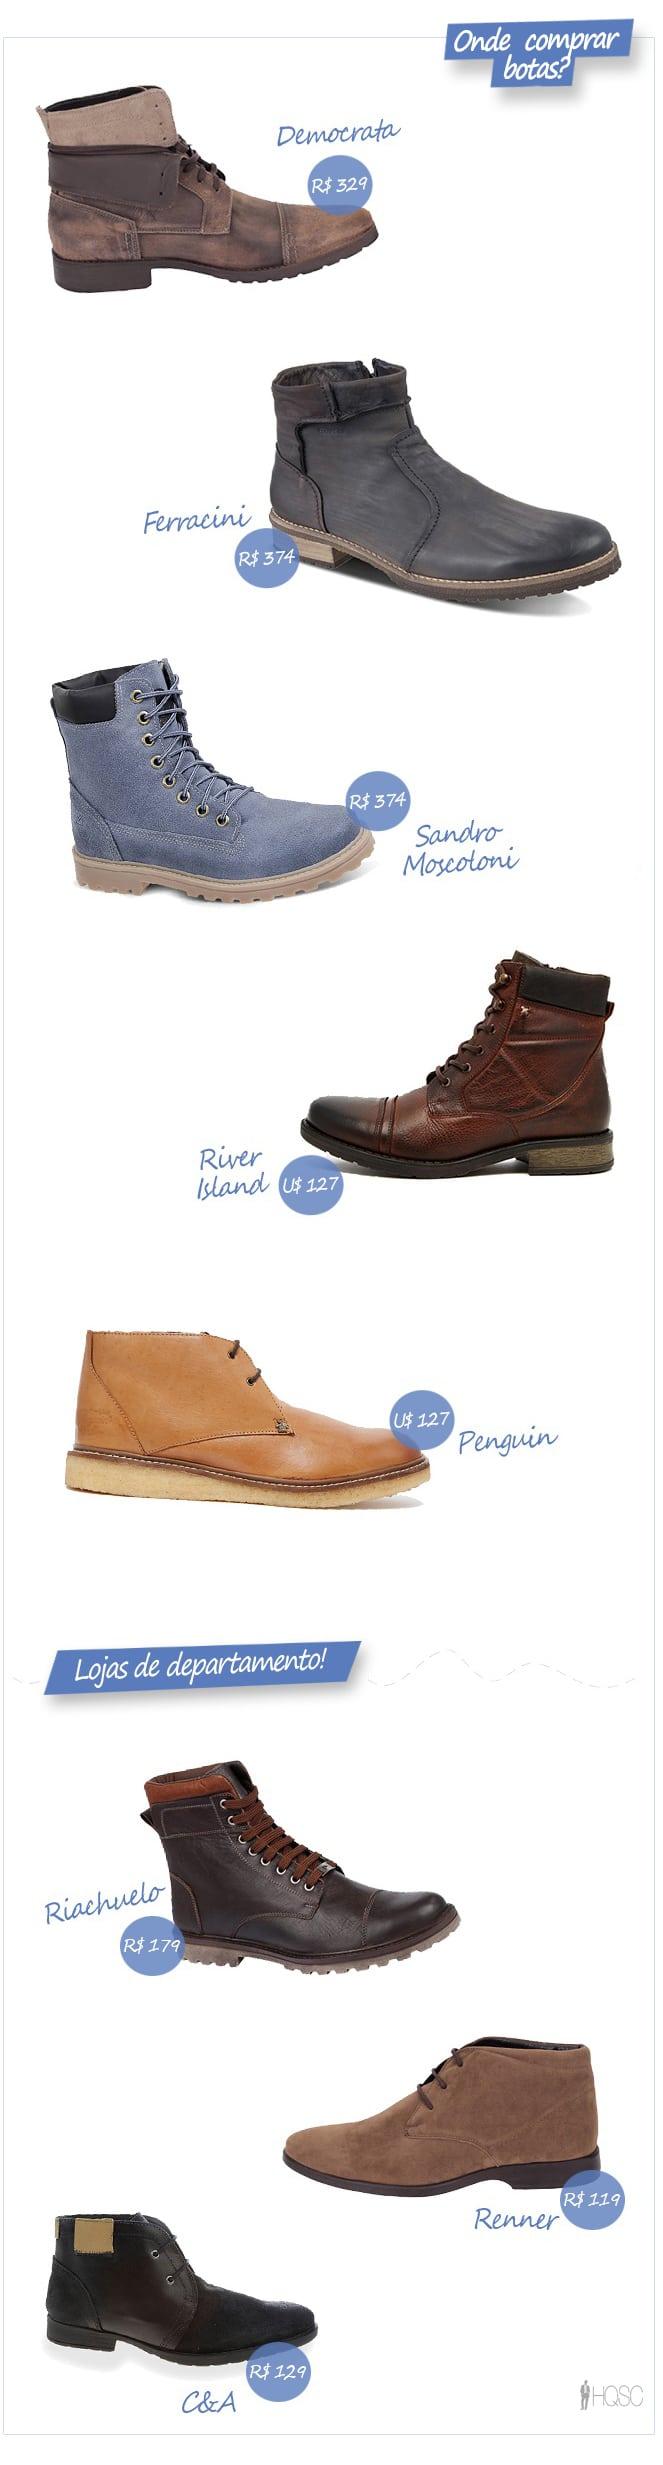 Onde comprar botas masculinas Homens que se cuidam